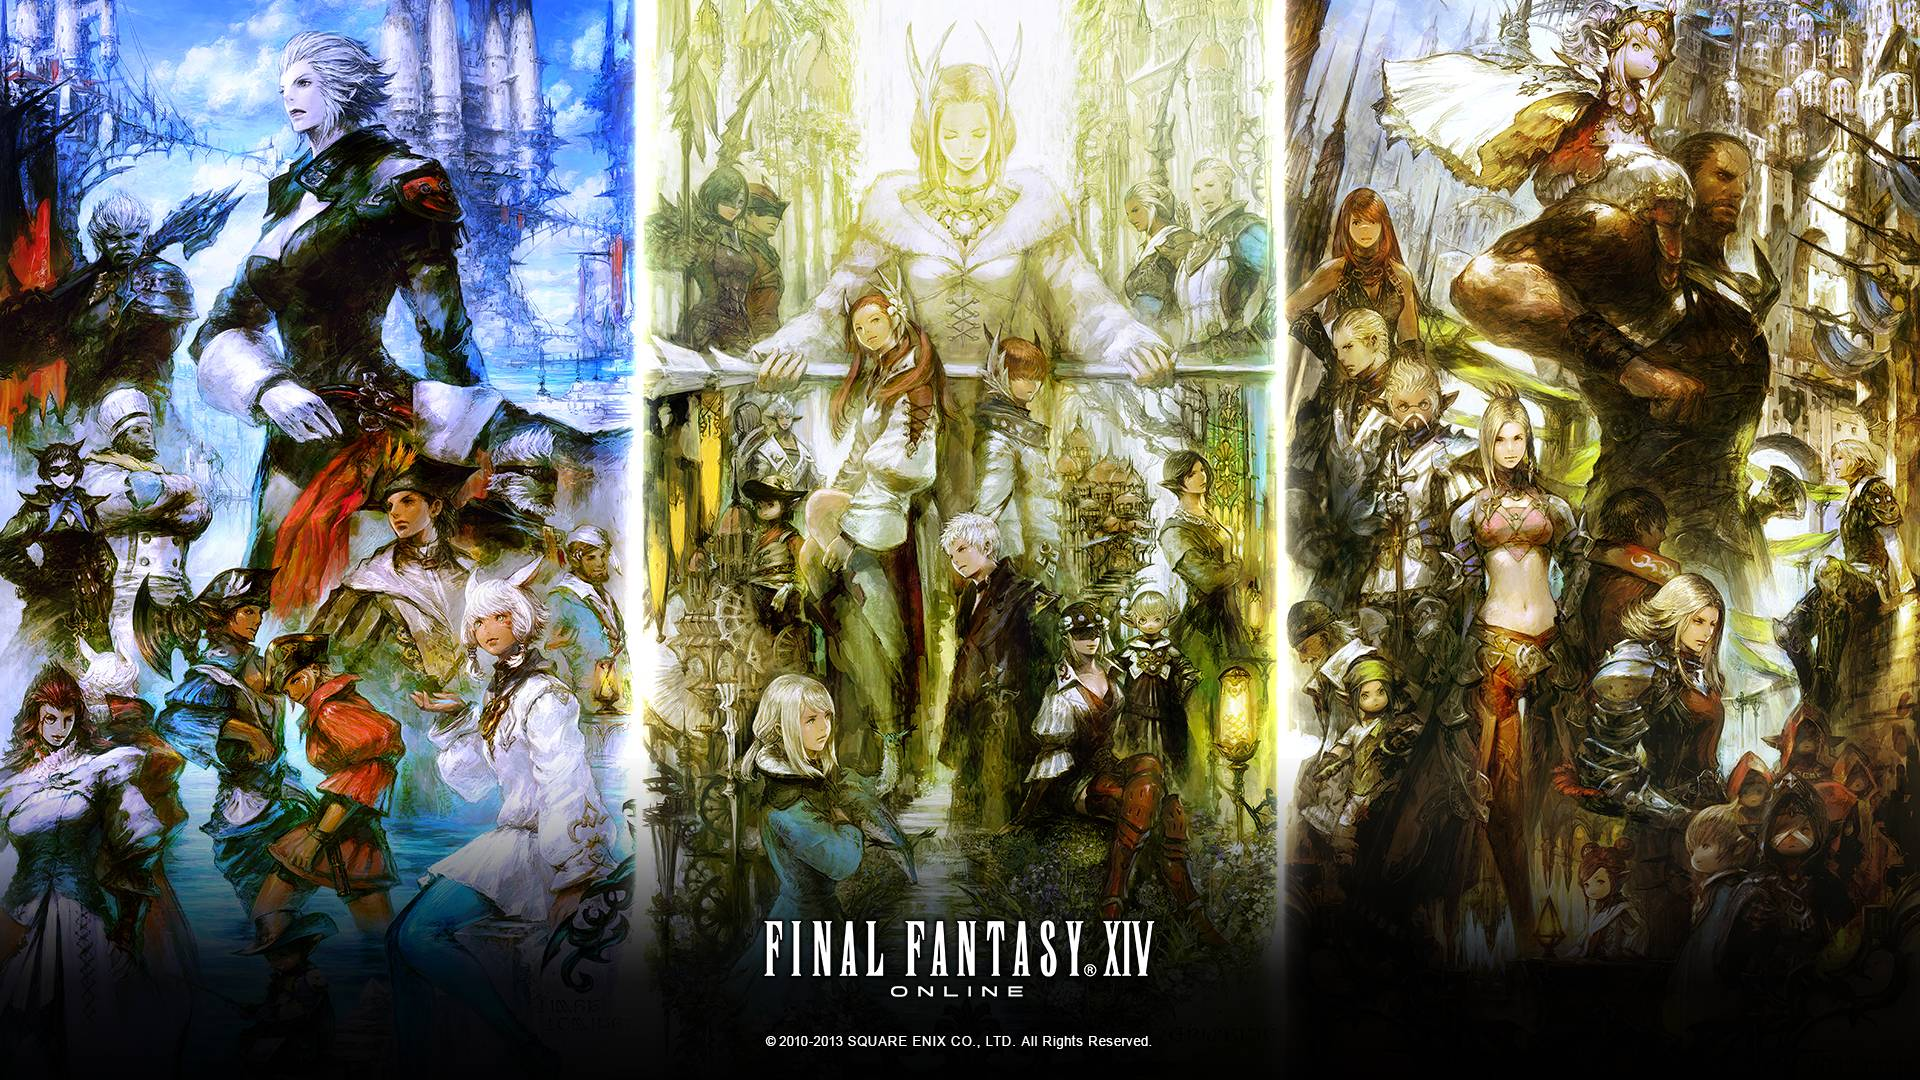 Final Fantasy XIV Wallpapers - Wallpaper Cave